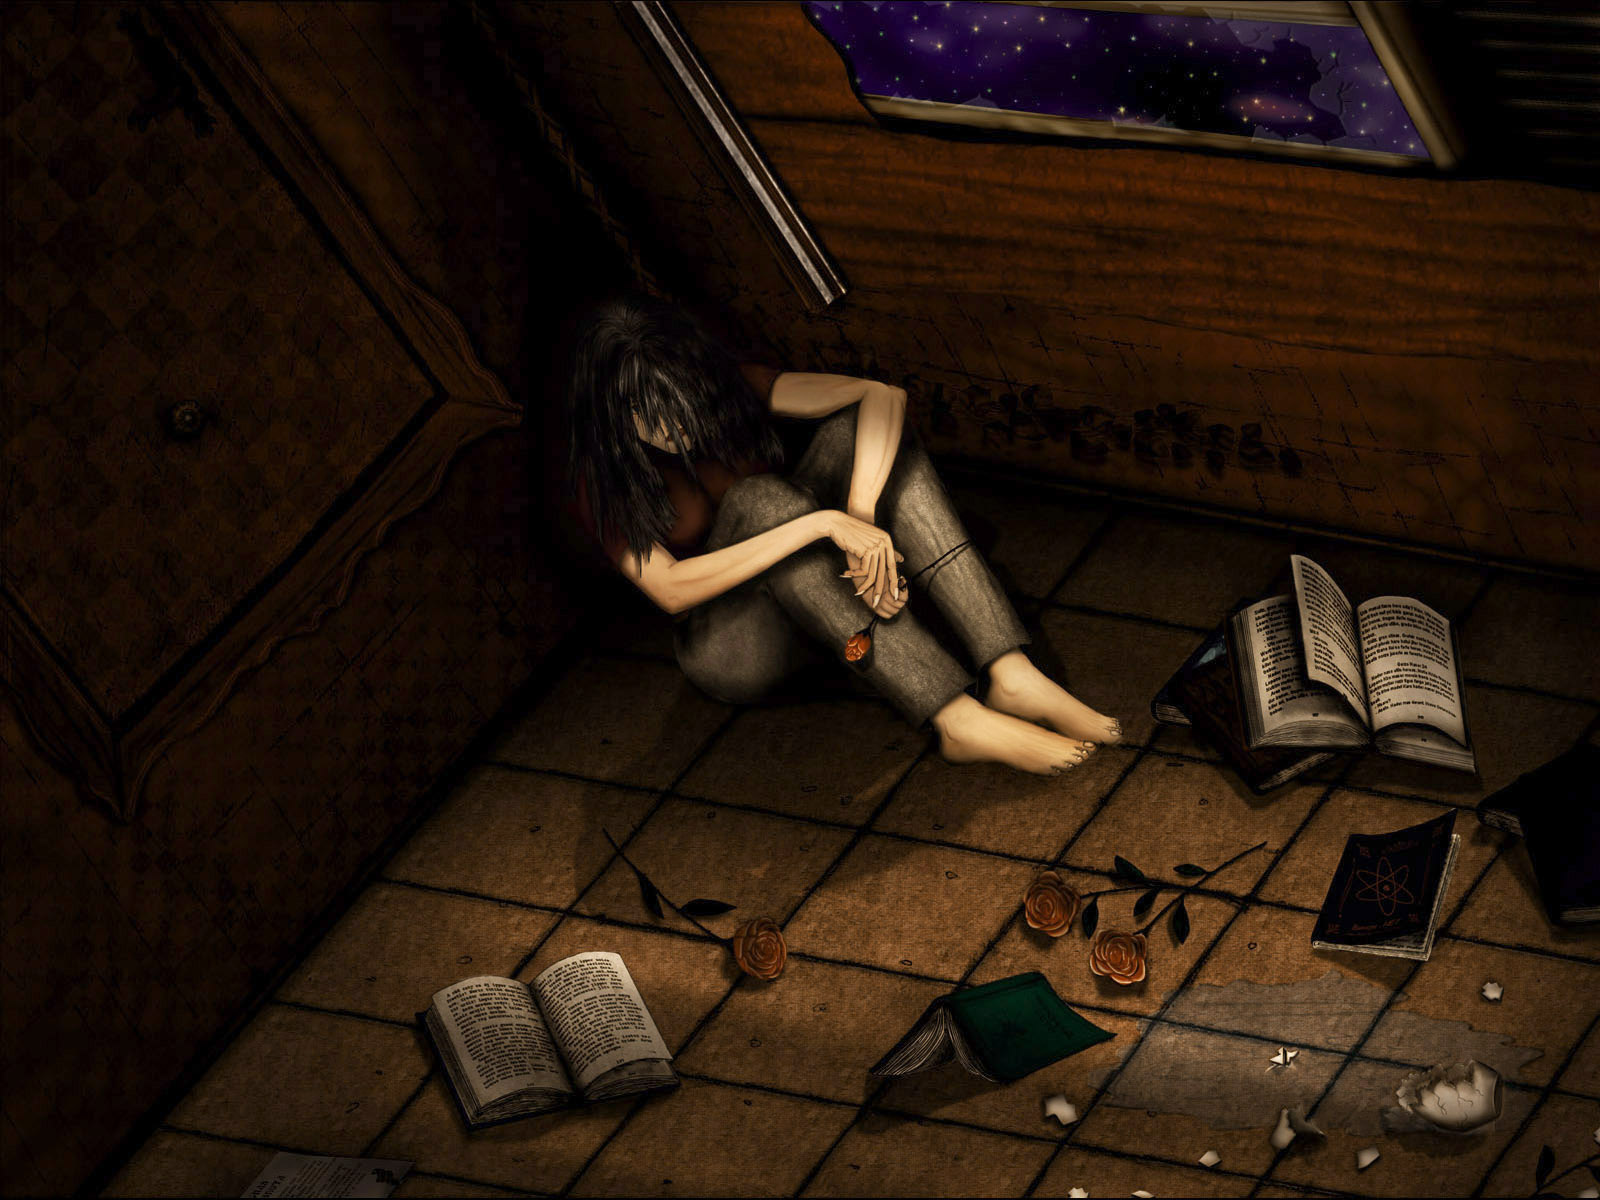 http://1.bp.blogspot.com/_Sln1aDZWLPo/TN121w7sXbI/AAAAAAAAACo/kWAMWl88L3A/s1600/girl-depressed-wallpapers_9440_1600x1200.jpg